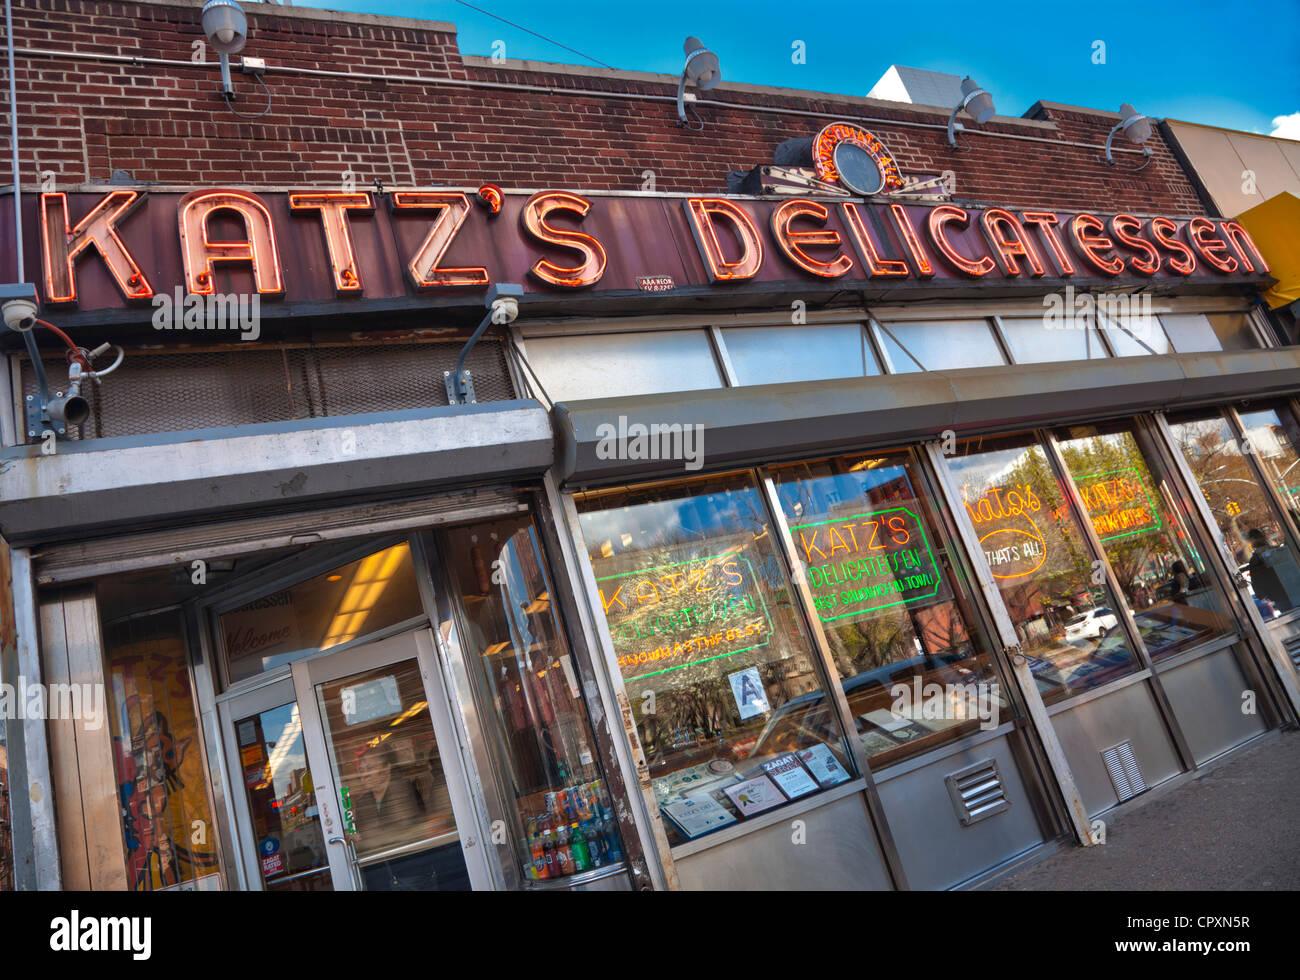 Katz's deli in New York City. Made famous in the film When Harry Met Sally - Stock Image